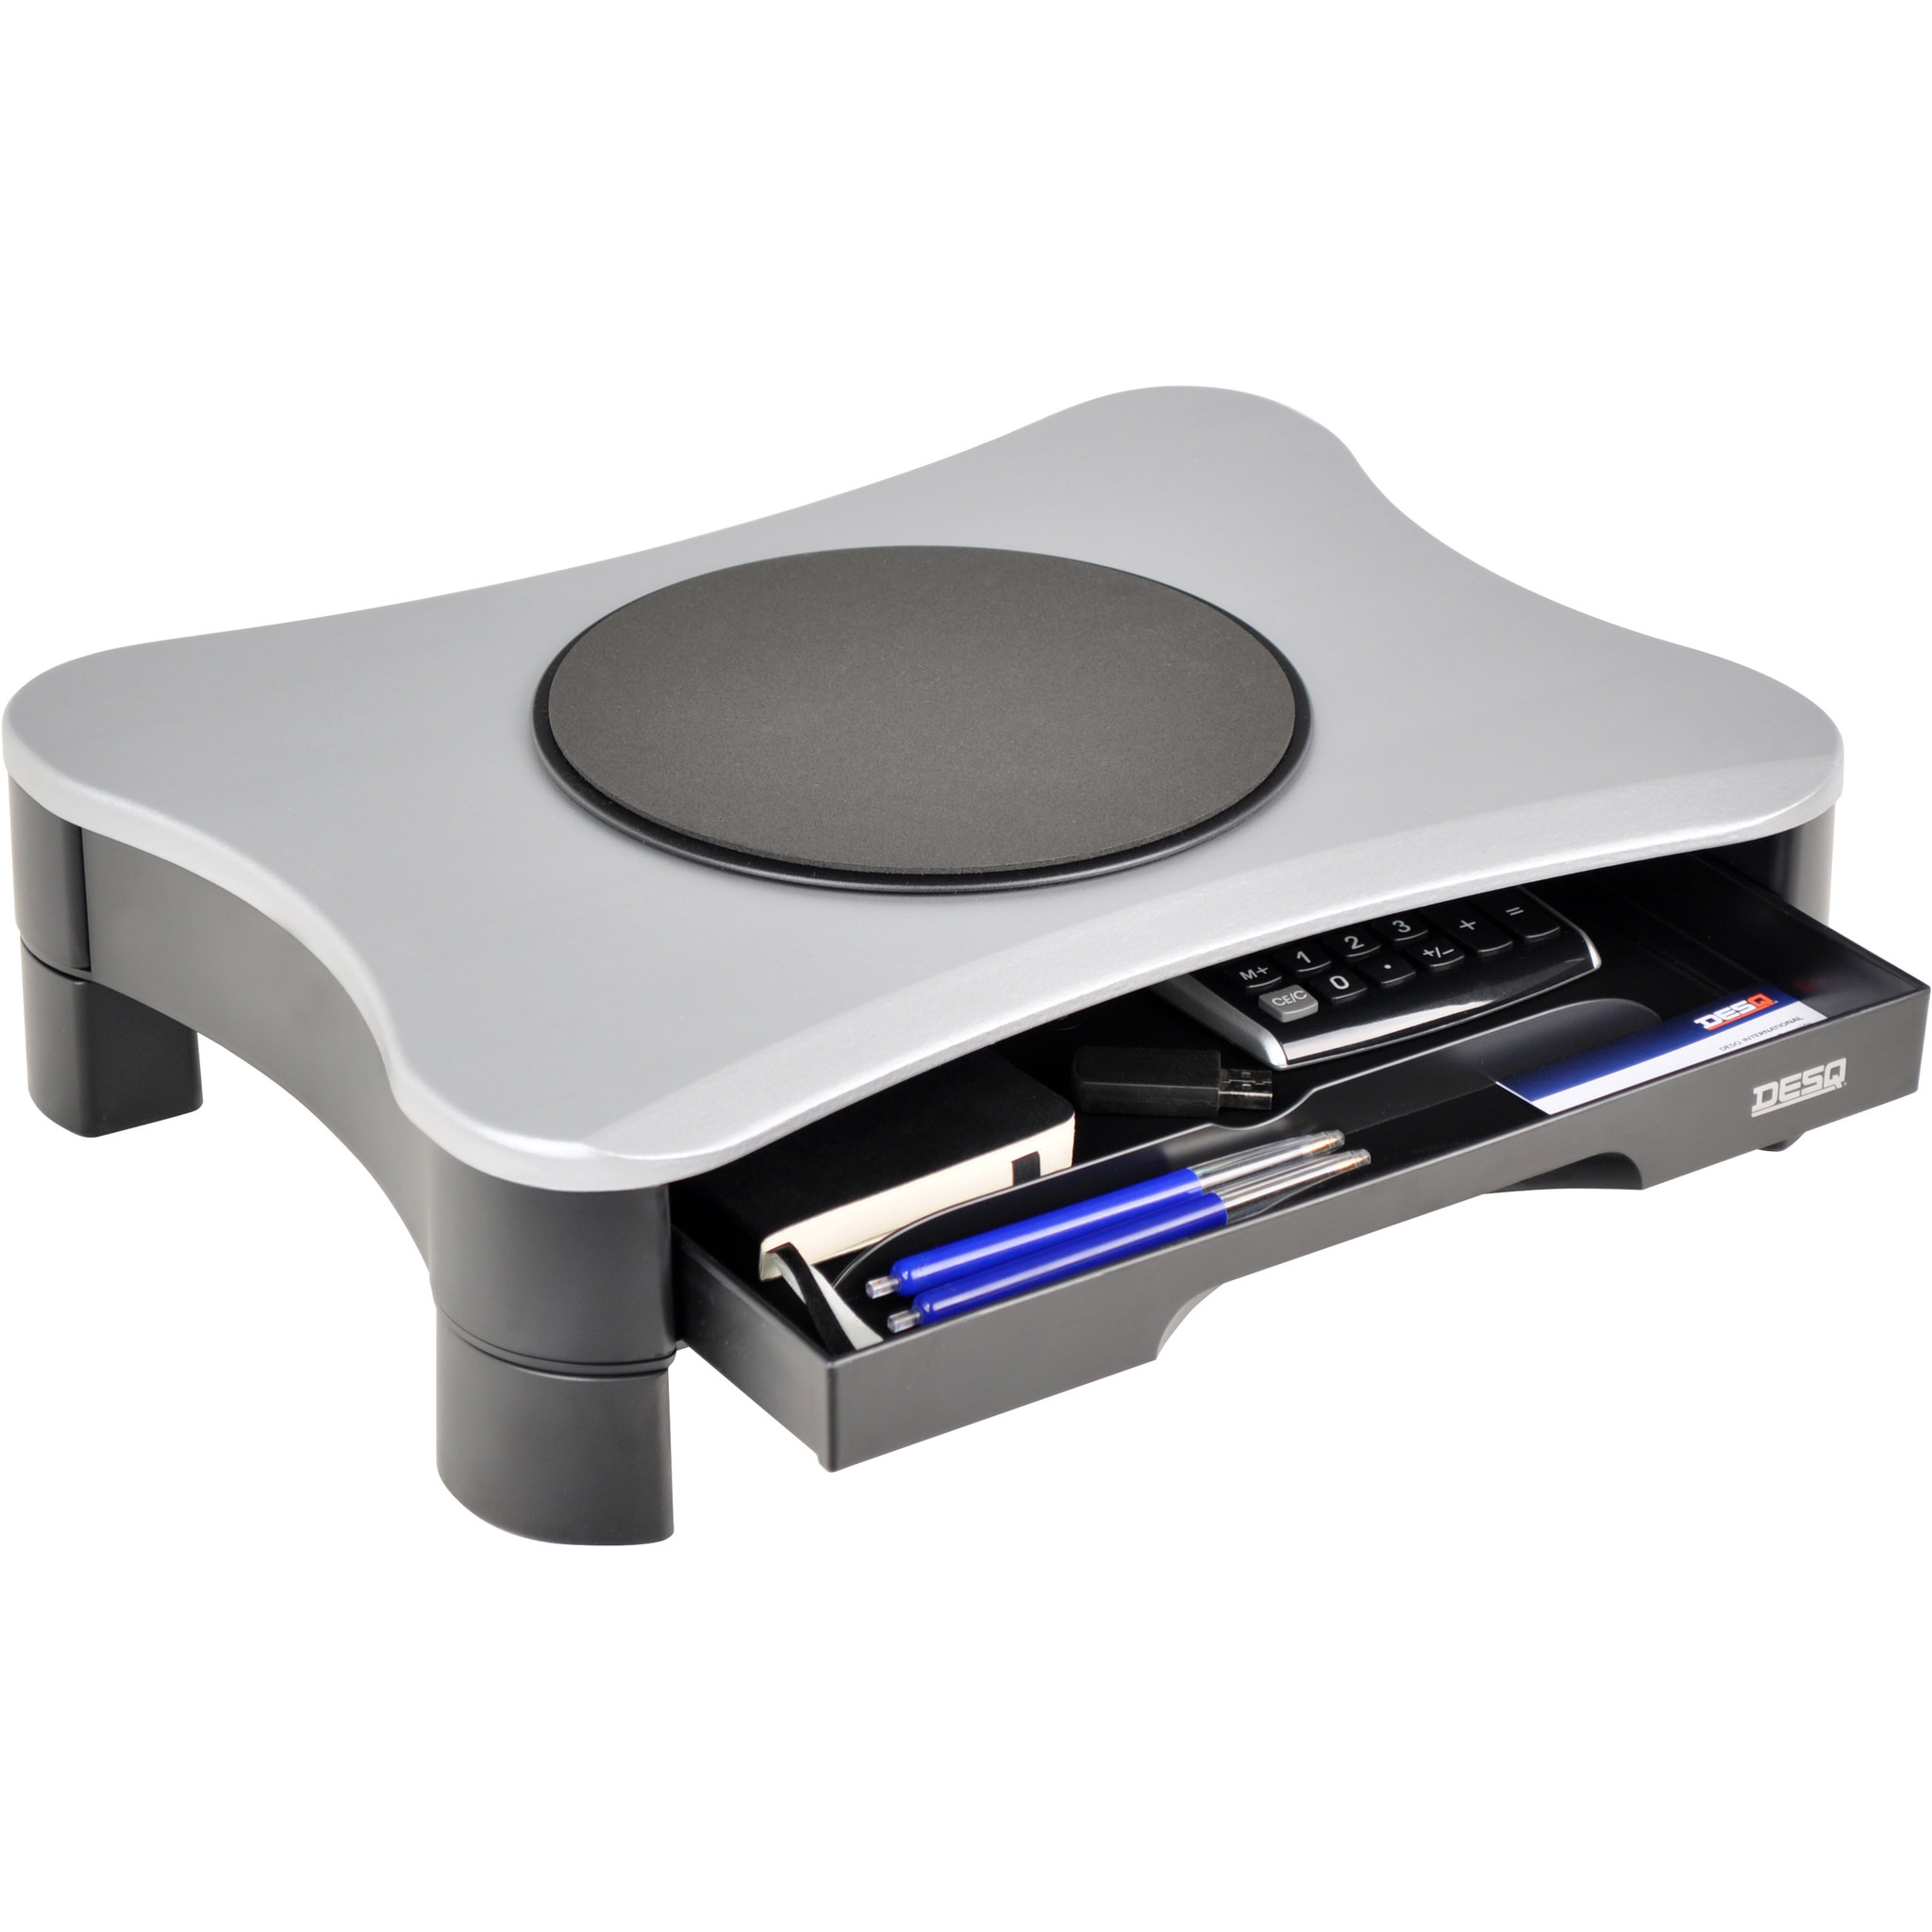 DESQ 1531 Monitorstandaard Square